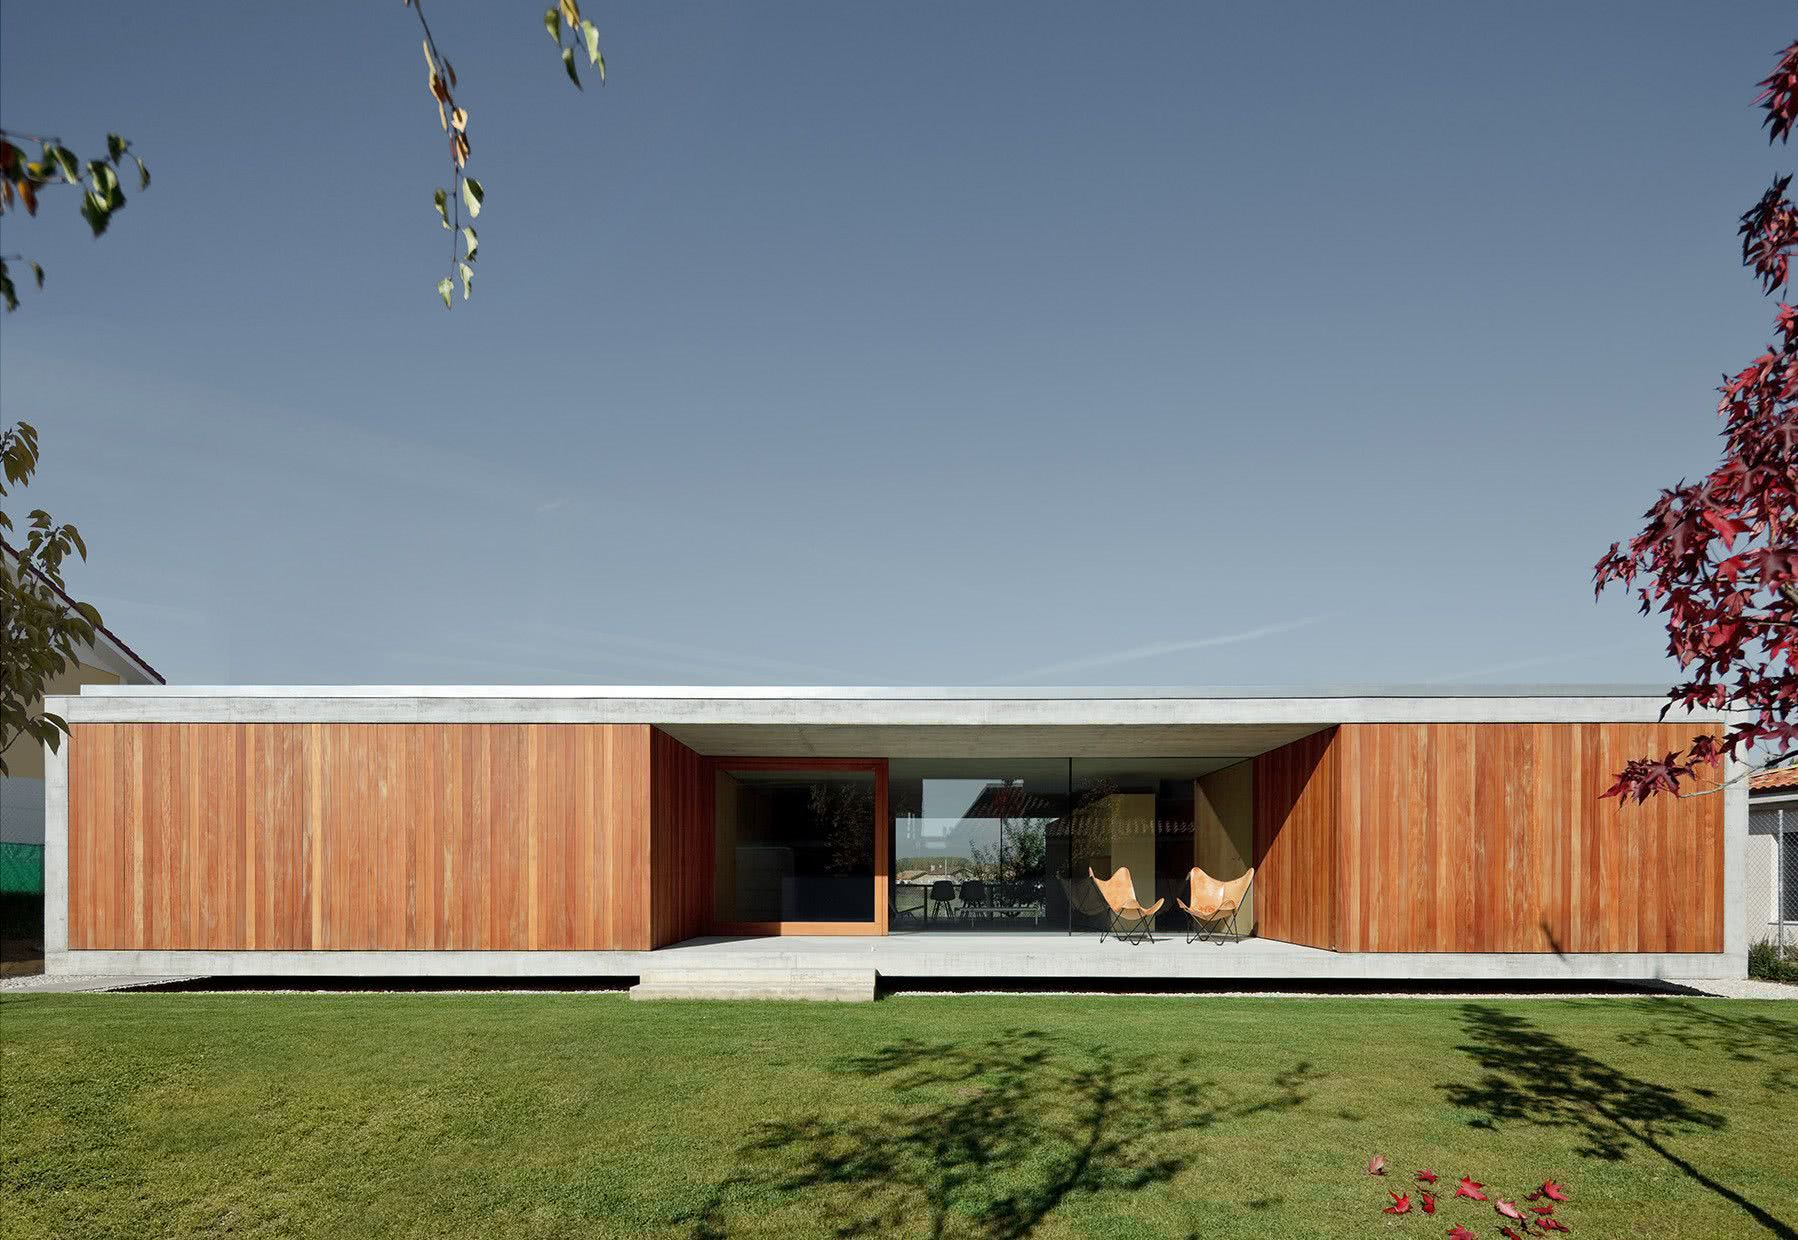 90 Fachadas De Casas T 233 Rreas Modelos E Fotos Incr 237 Veis